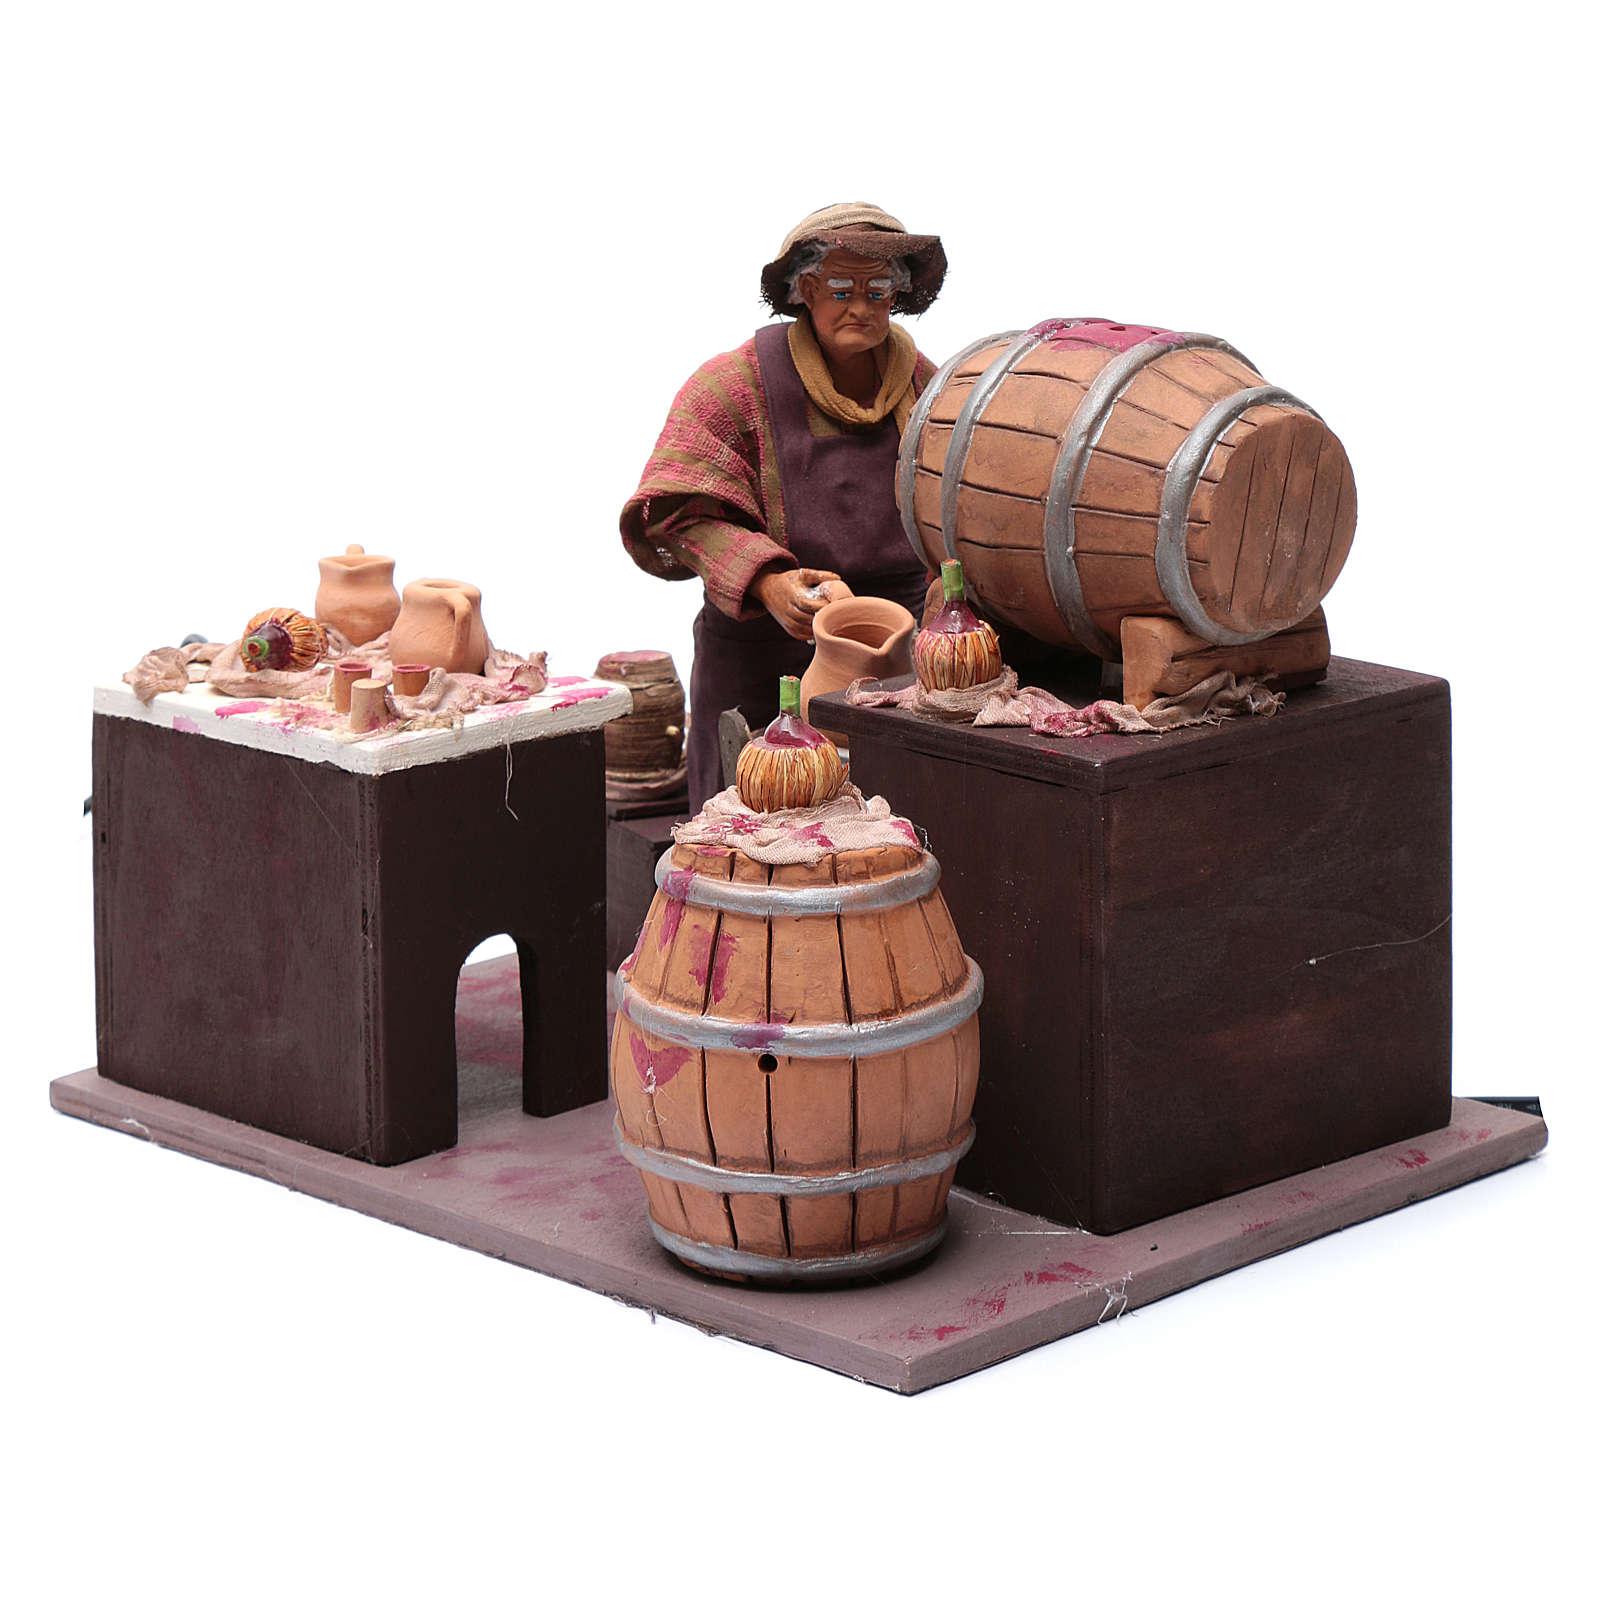 Wine seller with barrel 24 cm for Neapolitan nativity scene 4